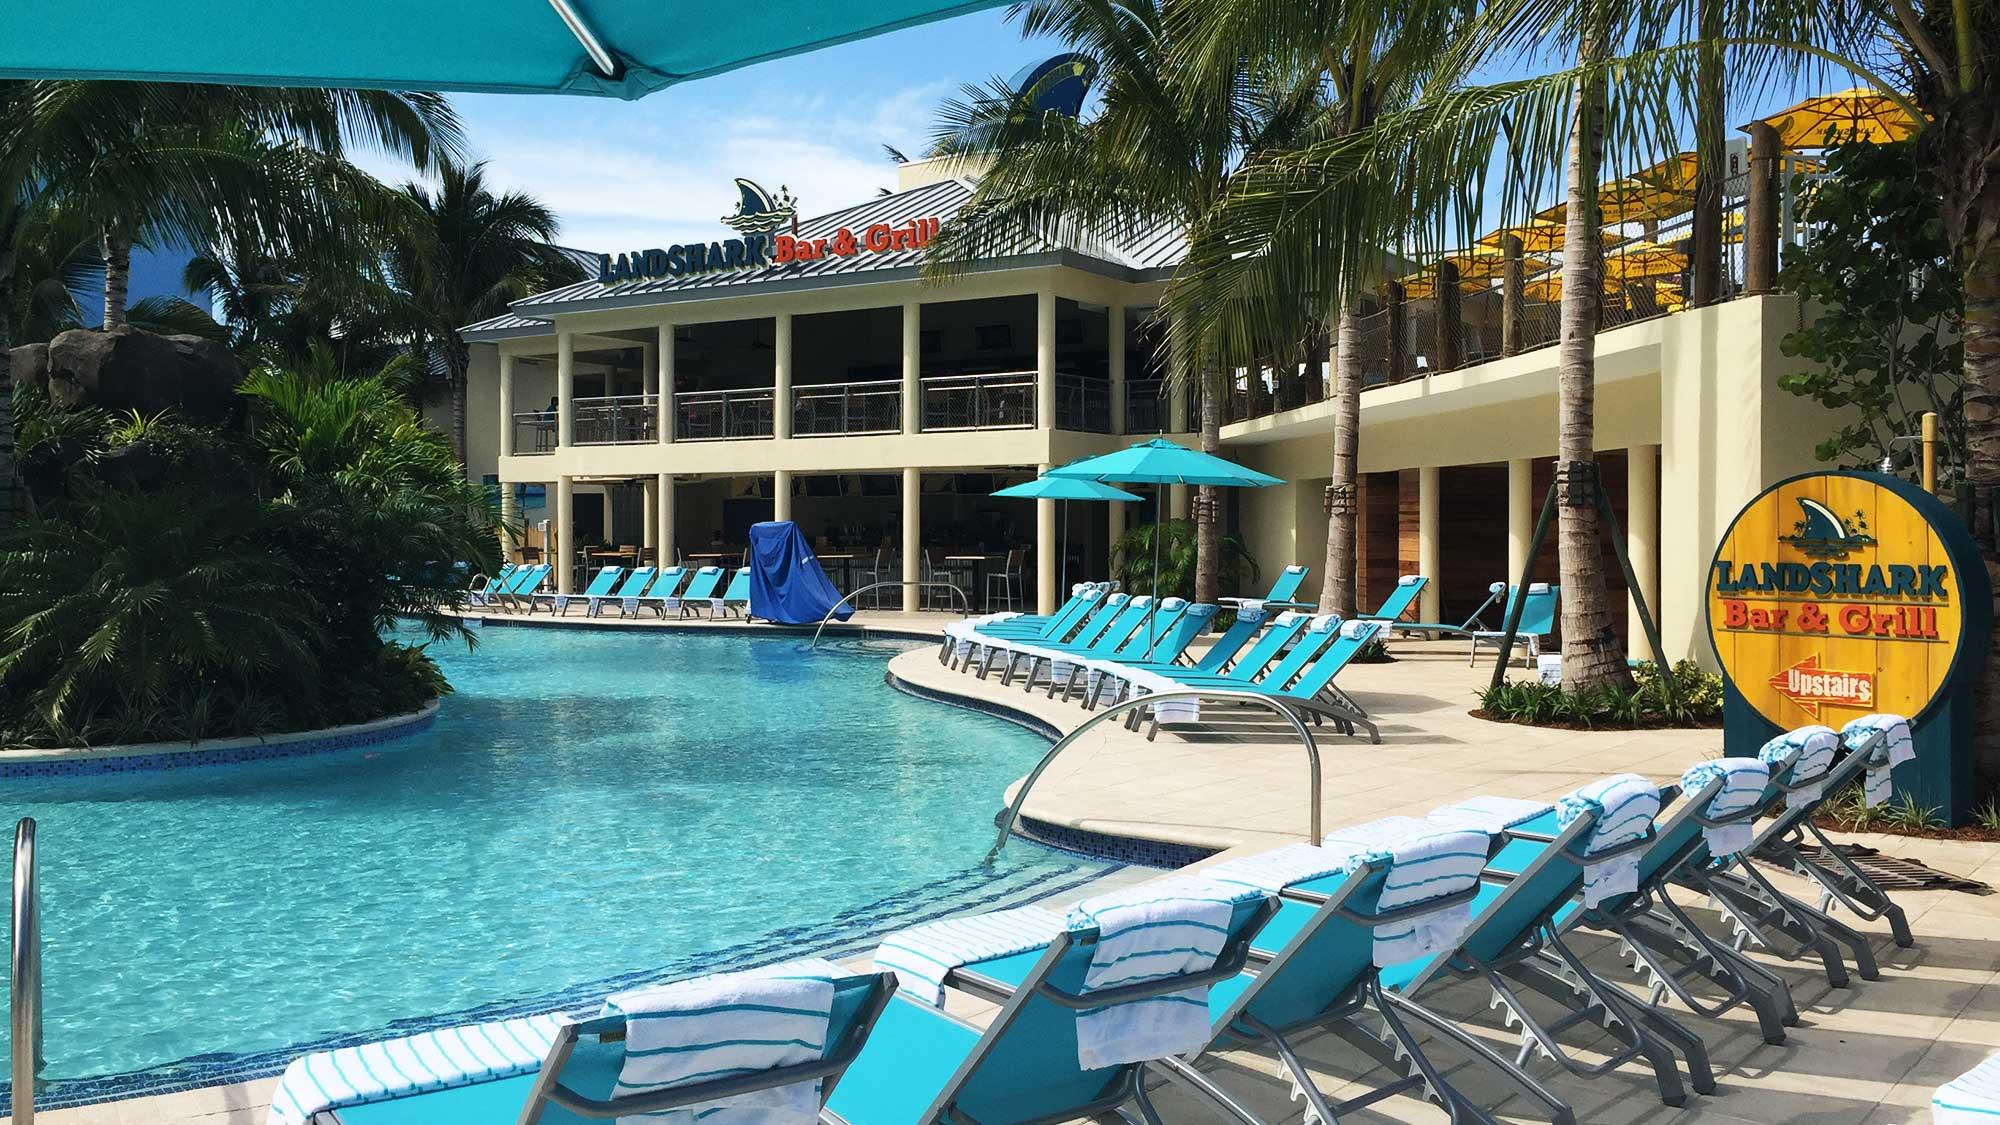 New Margaritaville resort a contender for meetings business